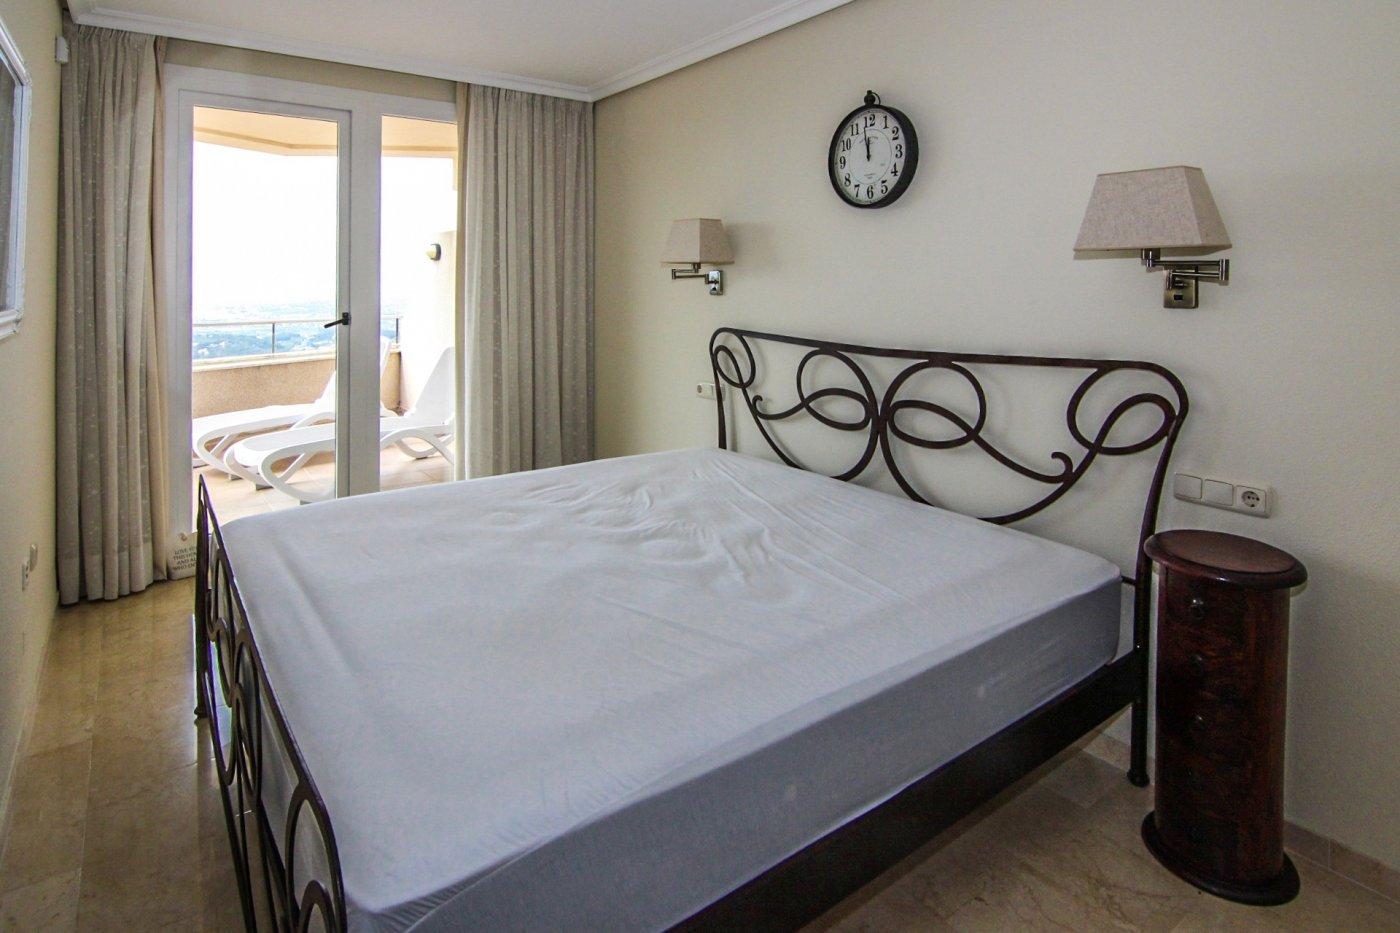 Apartment - Ready To Move And Live - Altea - Altea